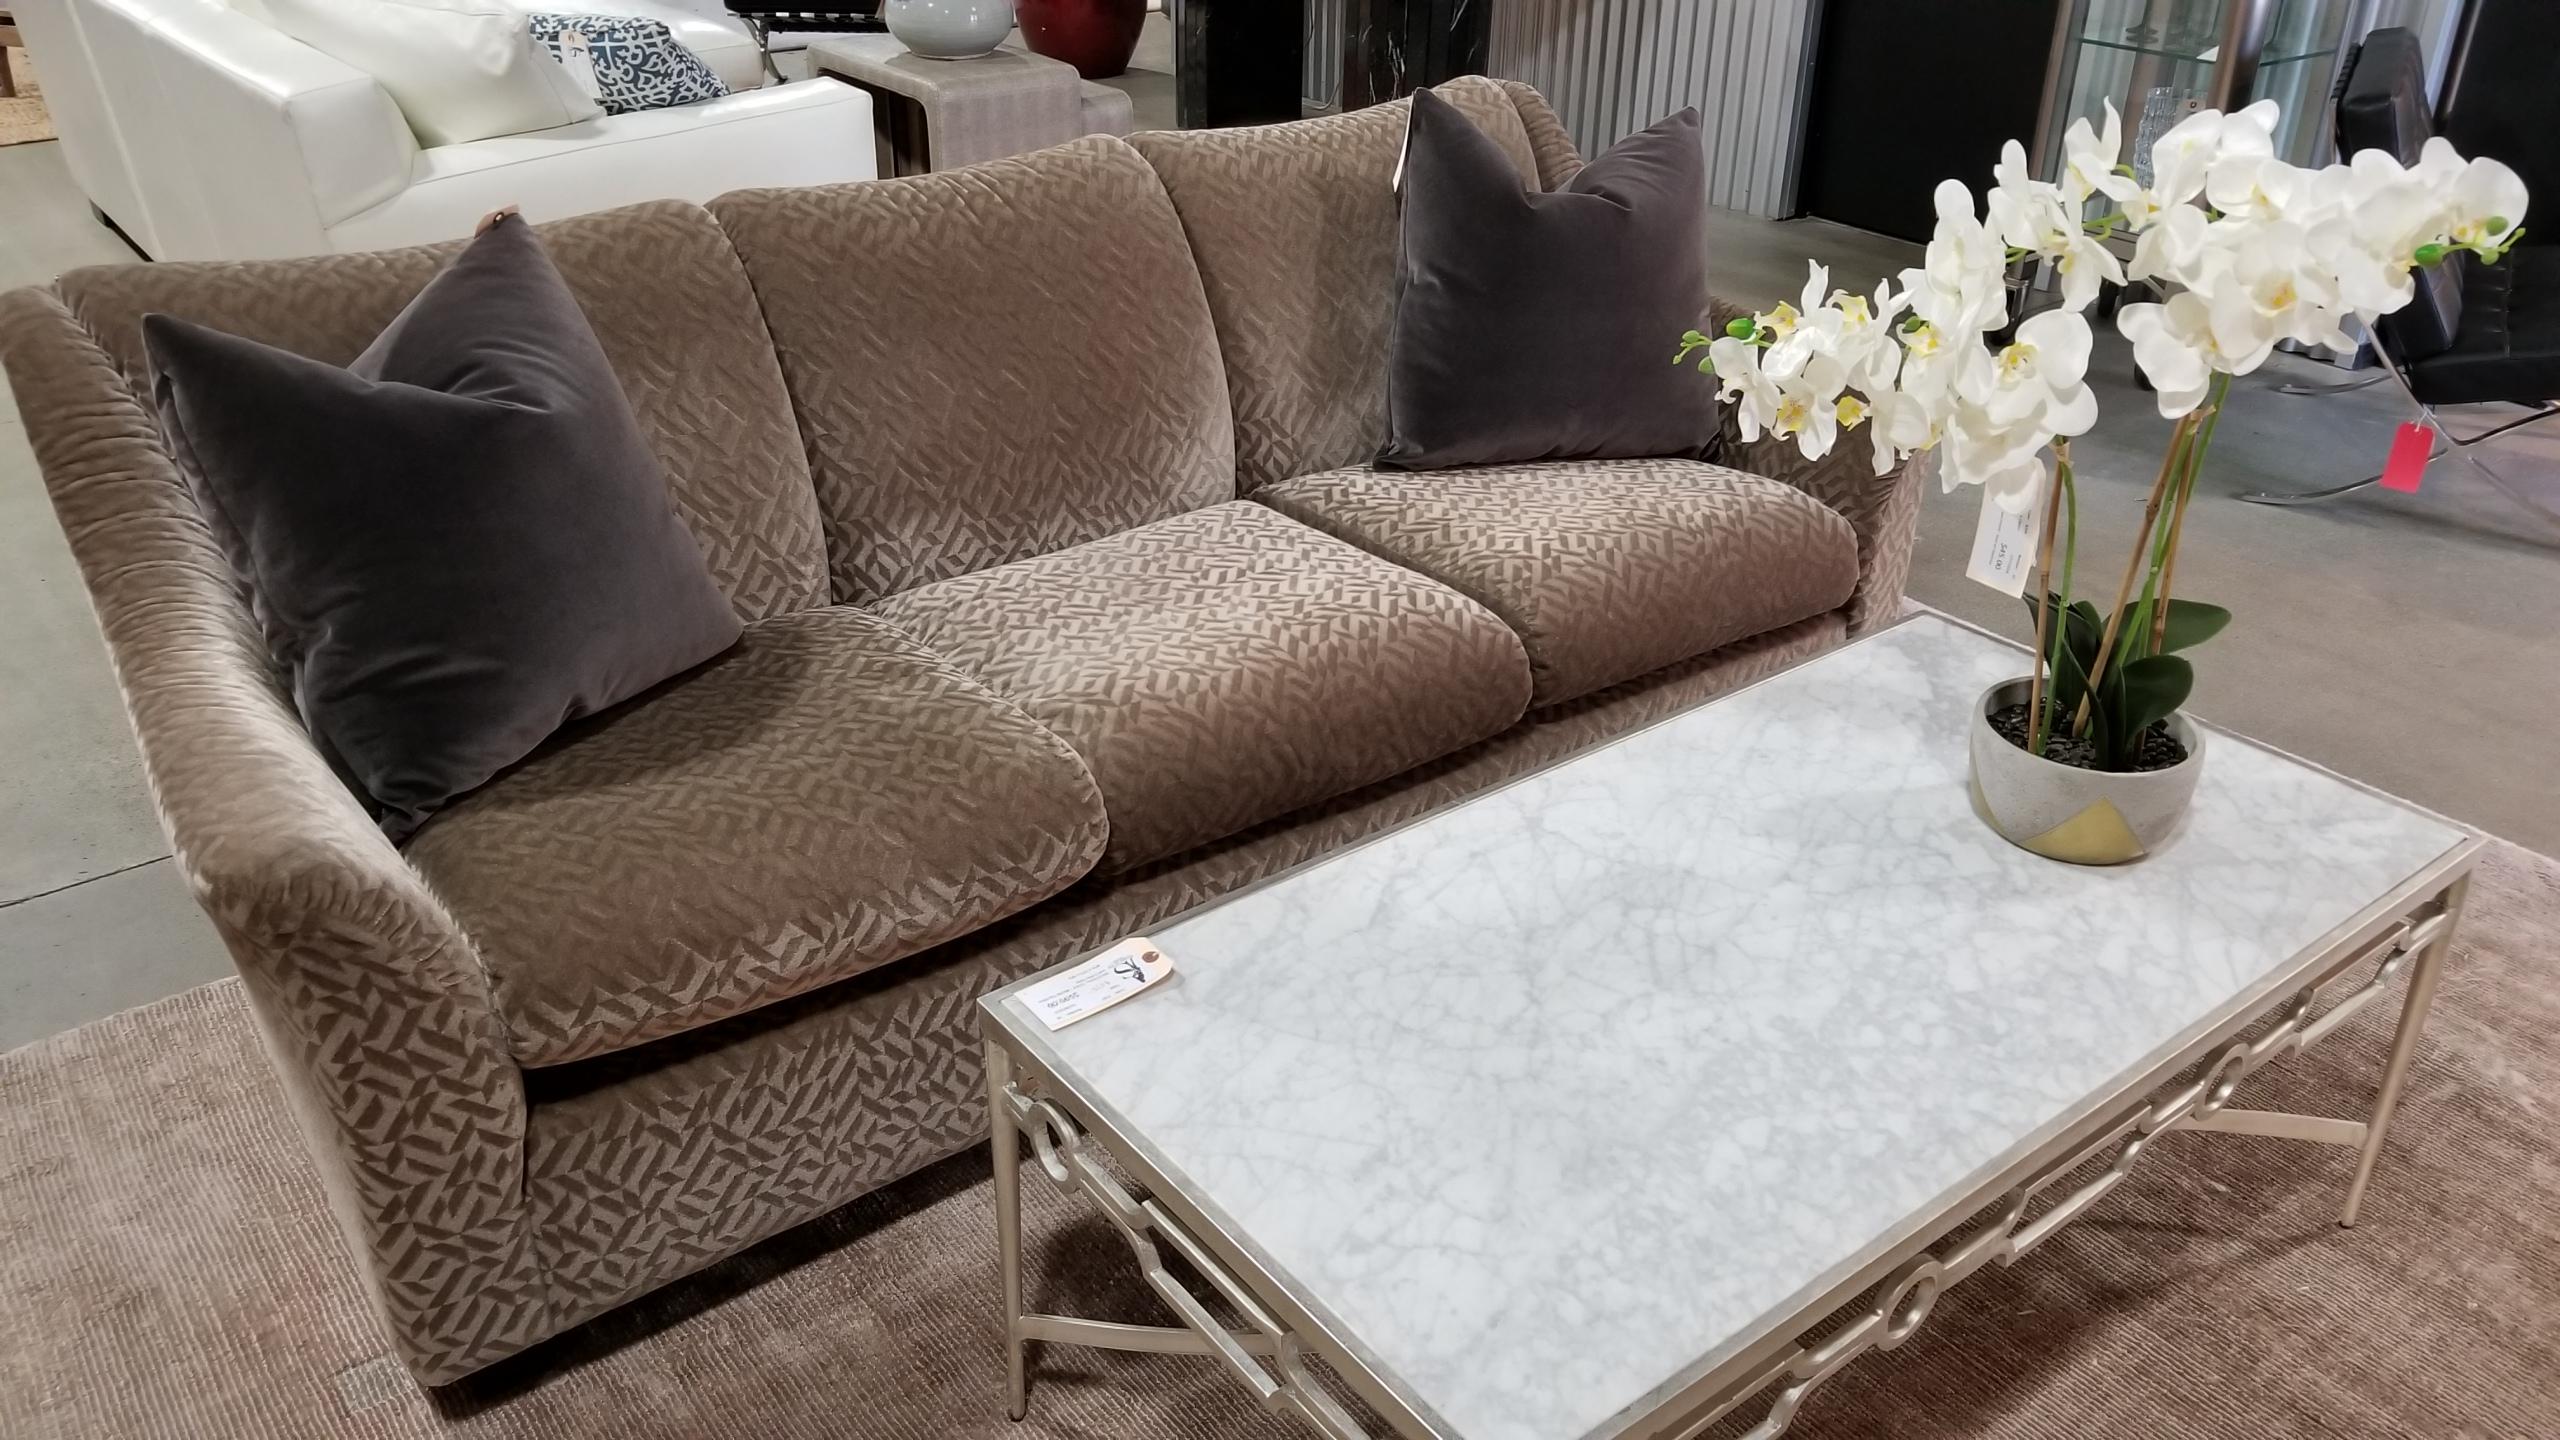 Custom Champagne Mohair Sofa U2013 Keilhauer Furniture U2013 Canada U2013 Knoll  Textiles Upholstery Measures 79u2033w X 36u2033d X 34u2033h, Original Retail Price Was  $6000, ...